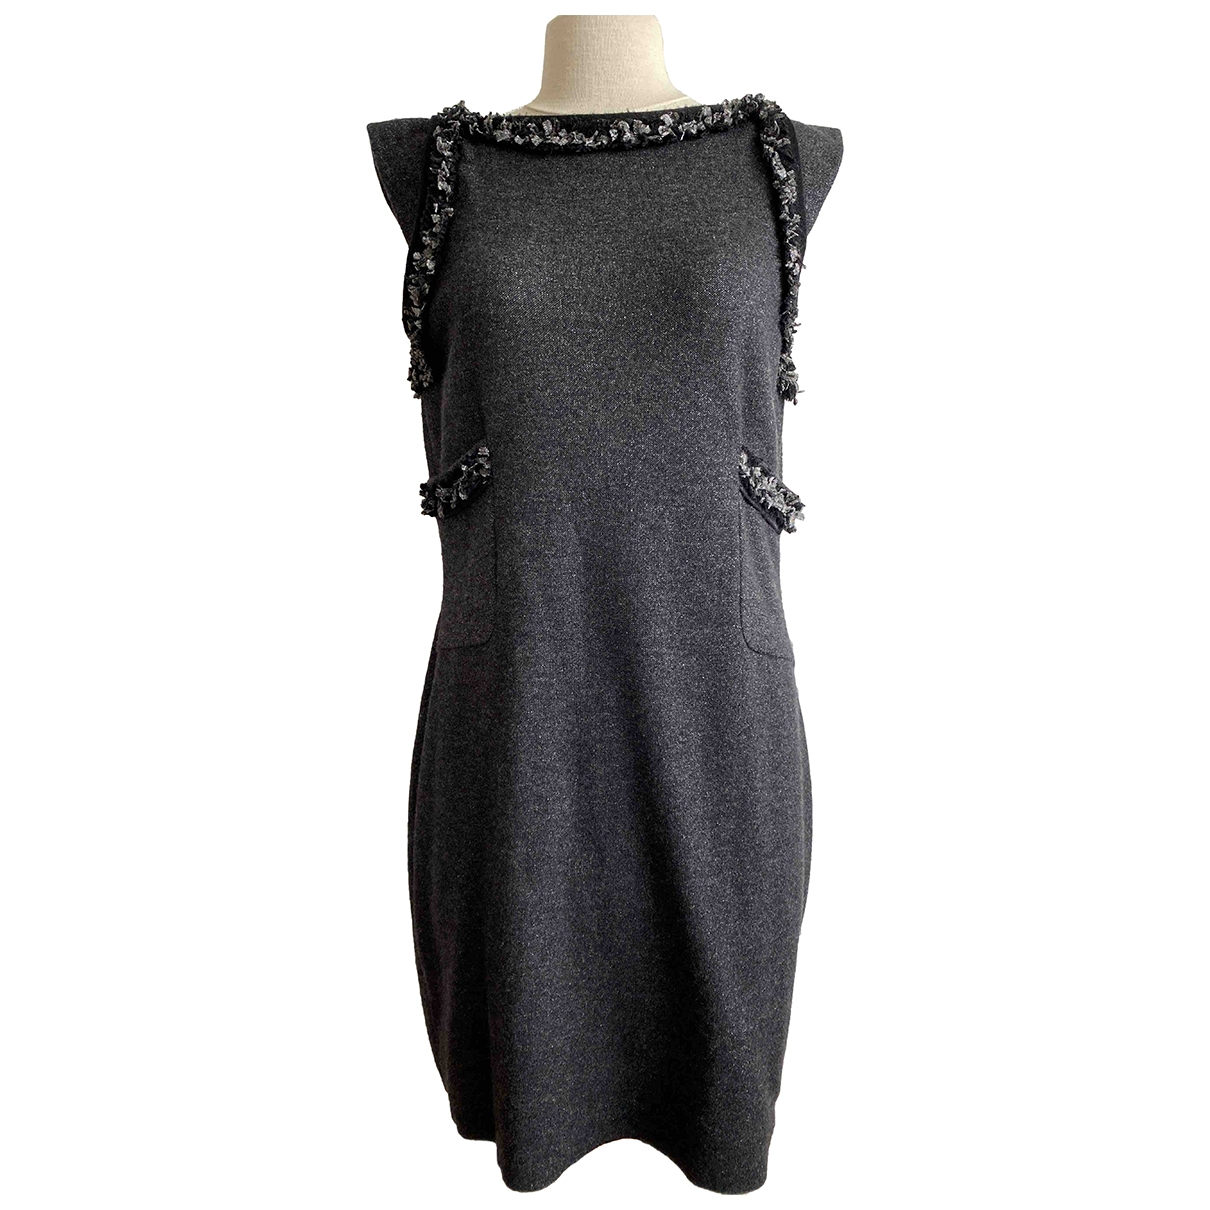 Chanel \N Kleid in  Anthrazit Kaschmir